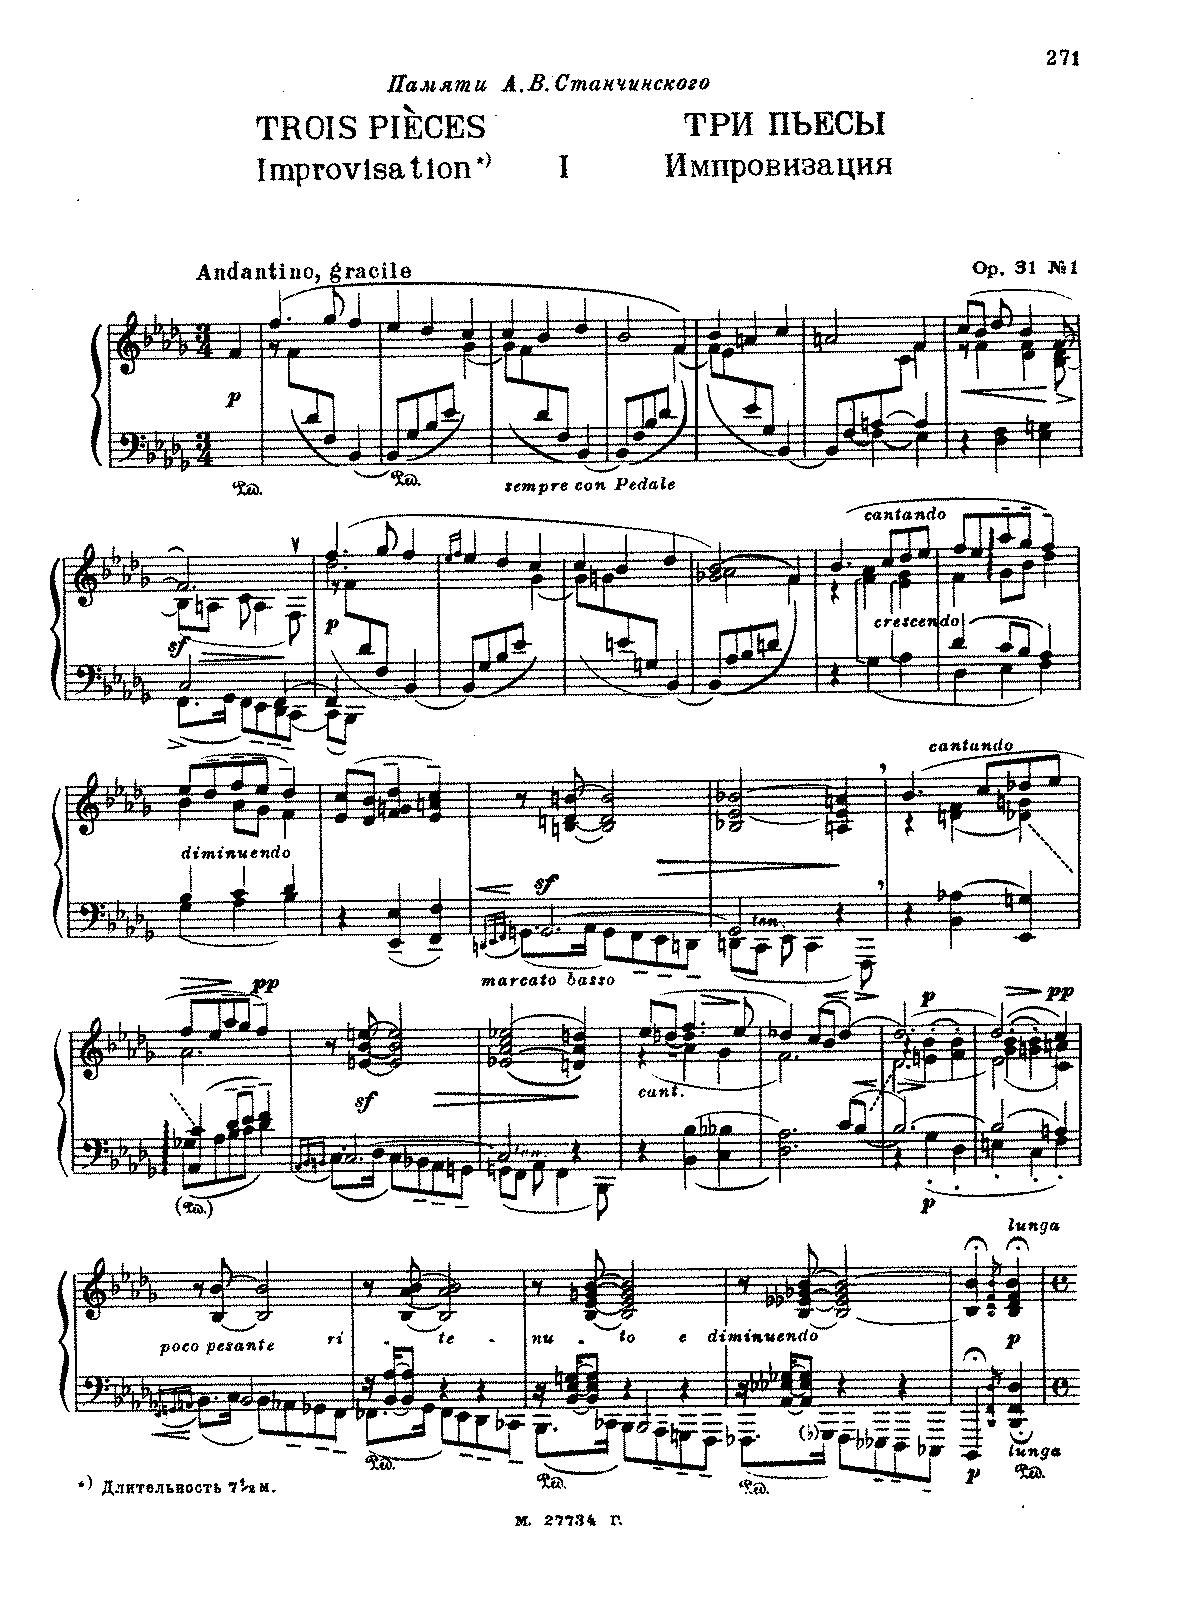 3 Morceaux, Op 31 (Medtner, Nikolay) - IMSLP/Petrucci Music Library